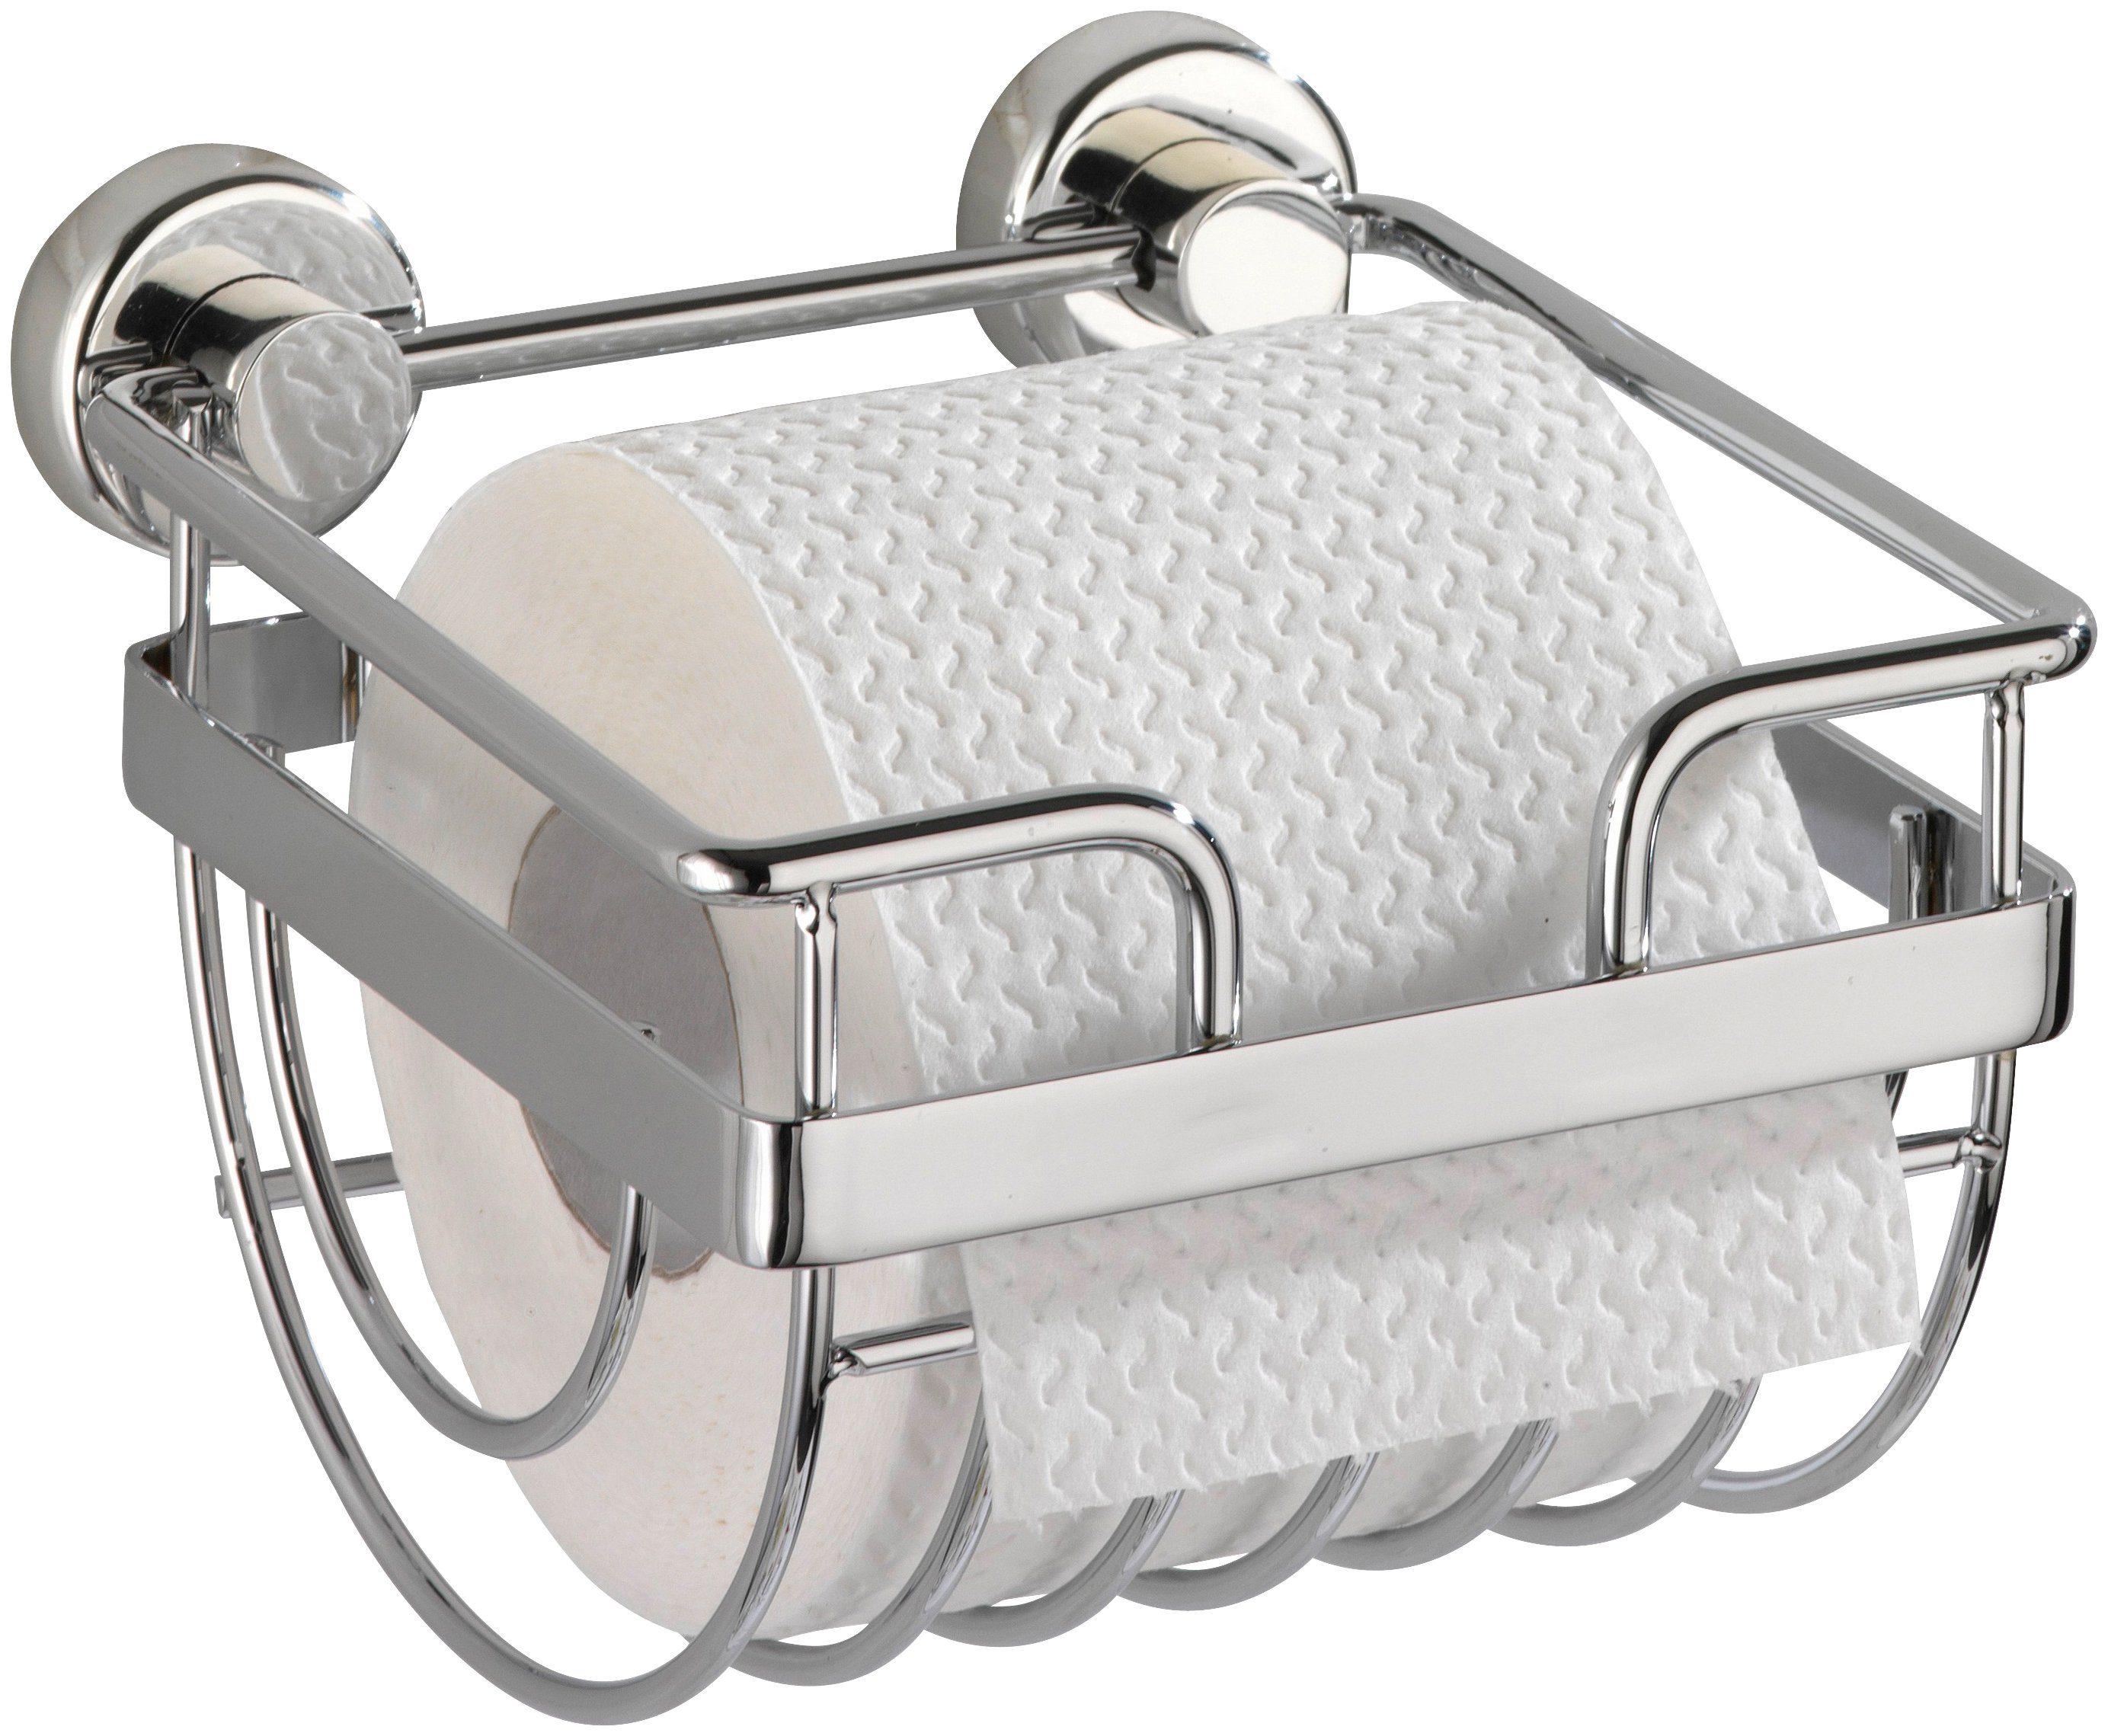 Toilettenpapierhalter »Sion«